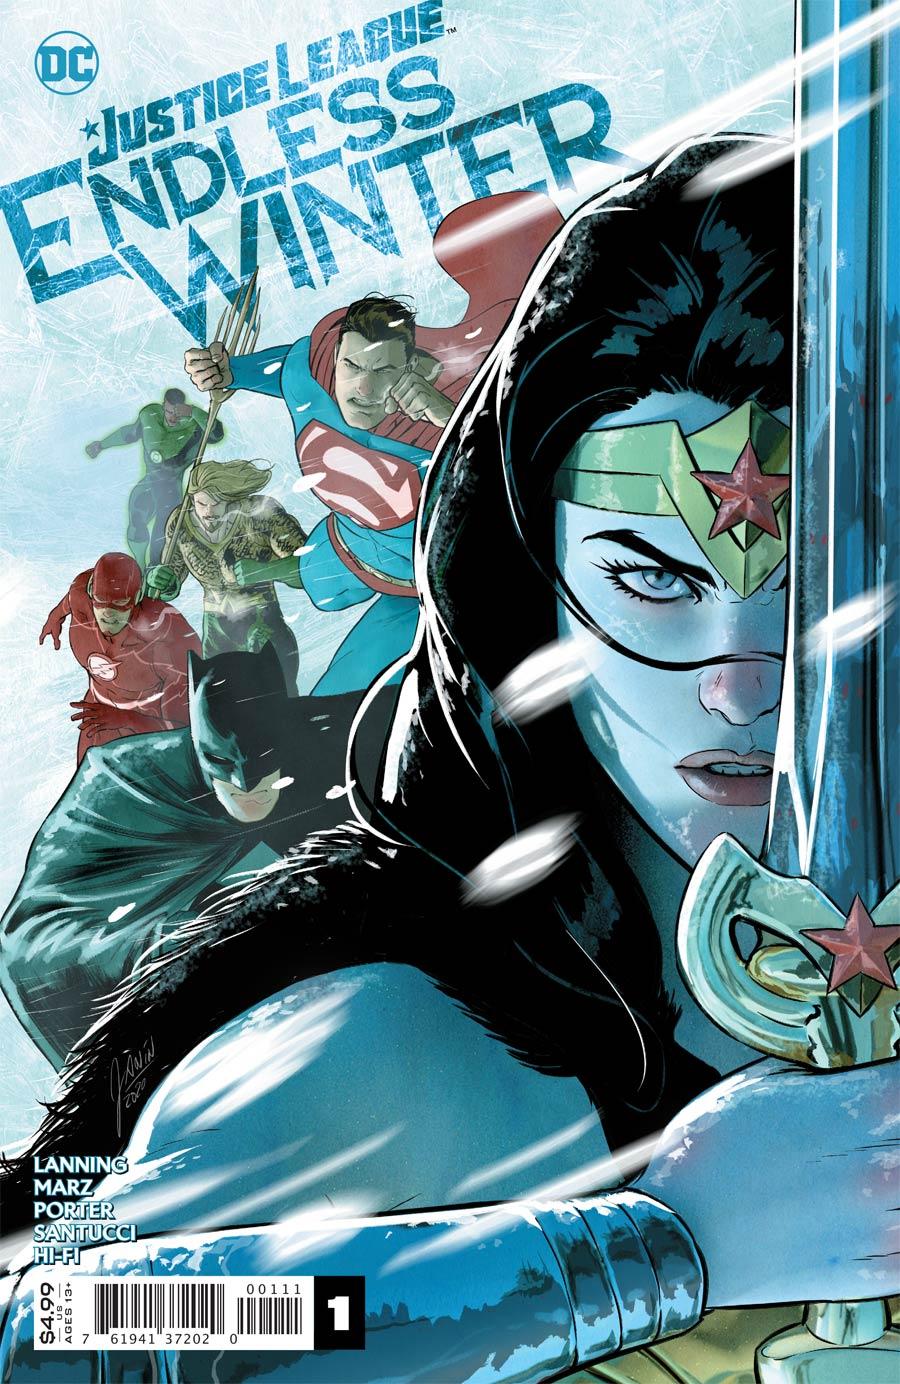 Justice League Endless Winter #1 Cover A Regular Mikel Janin (Endless Winter Part 1)